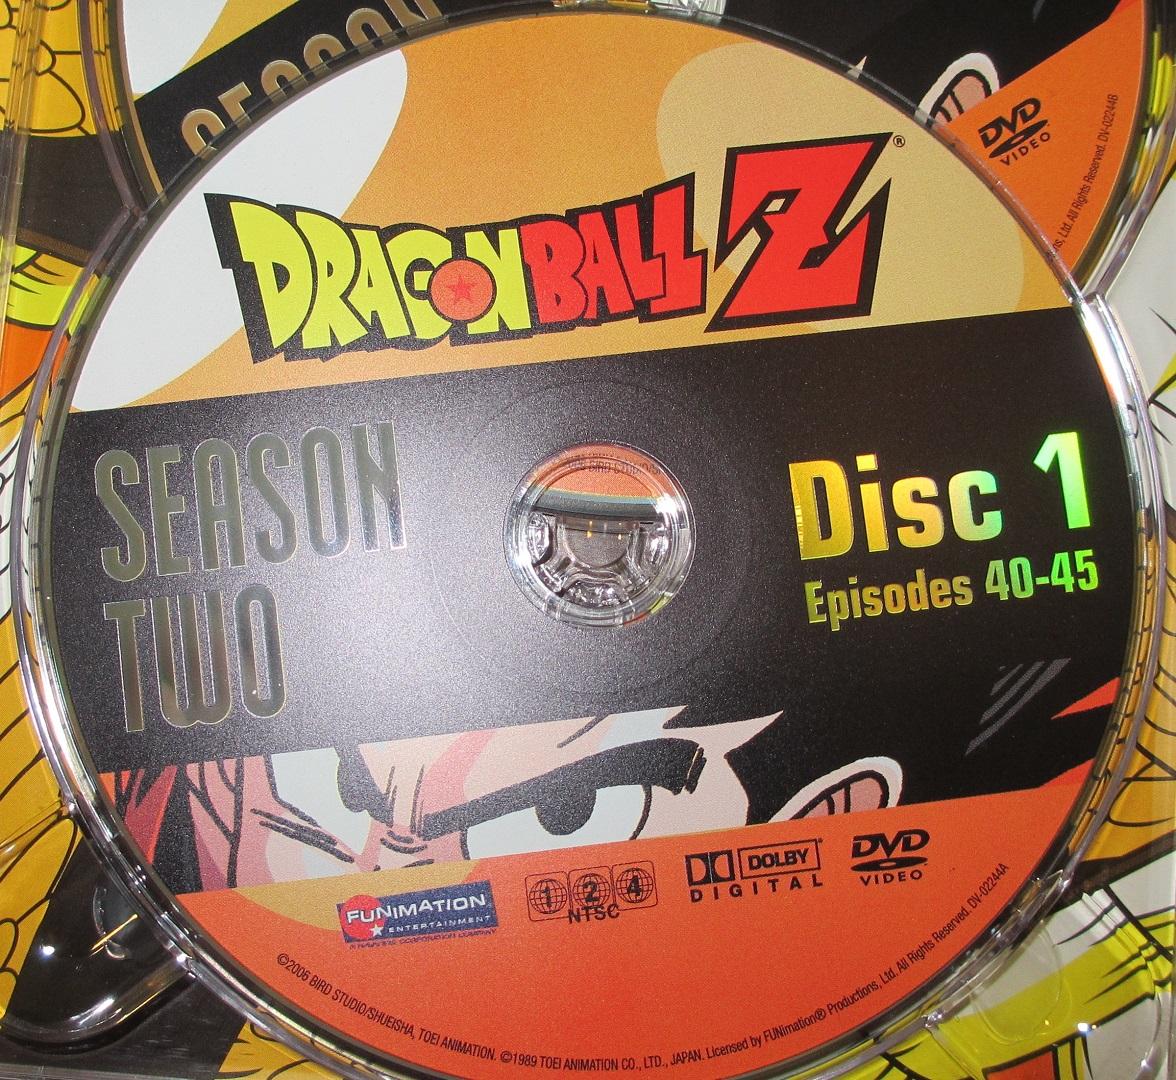 Original Dragon Ball Z Season 2 Disc 1